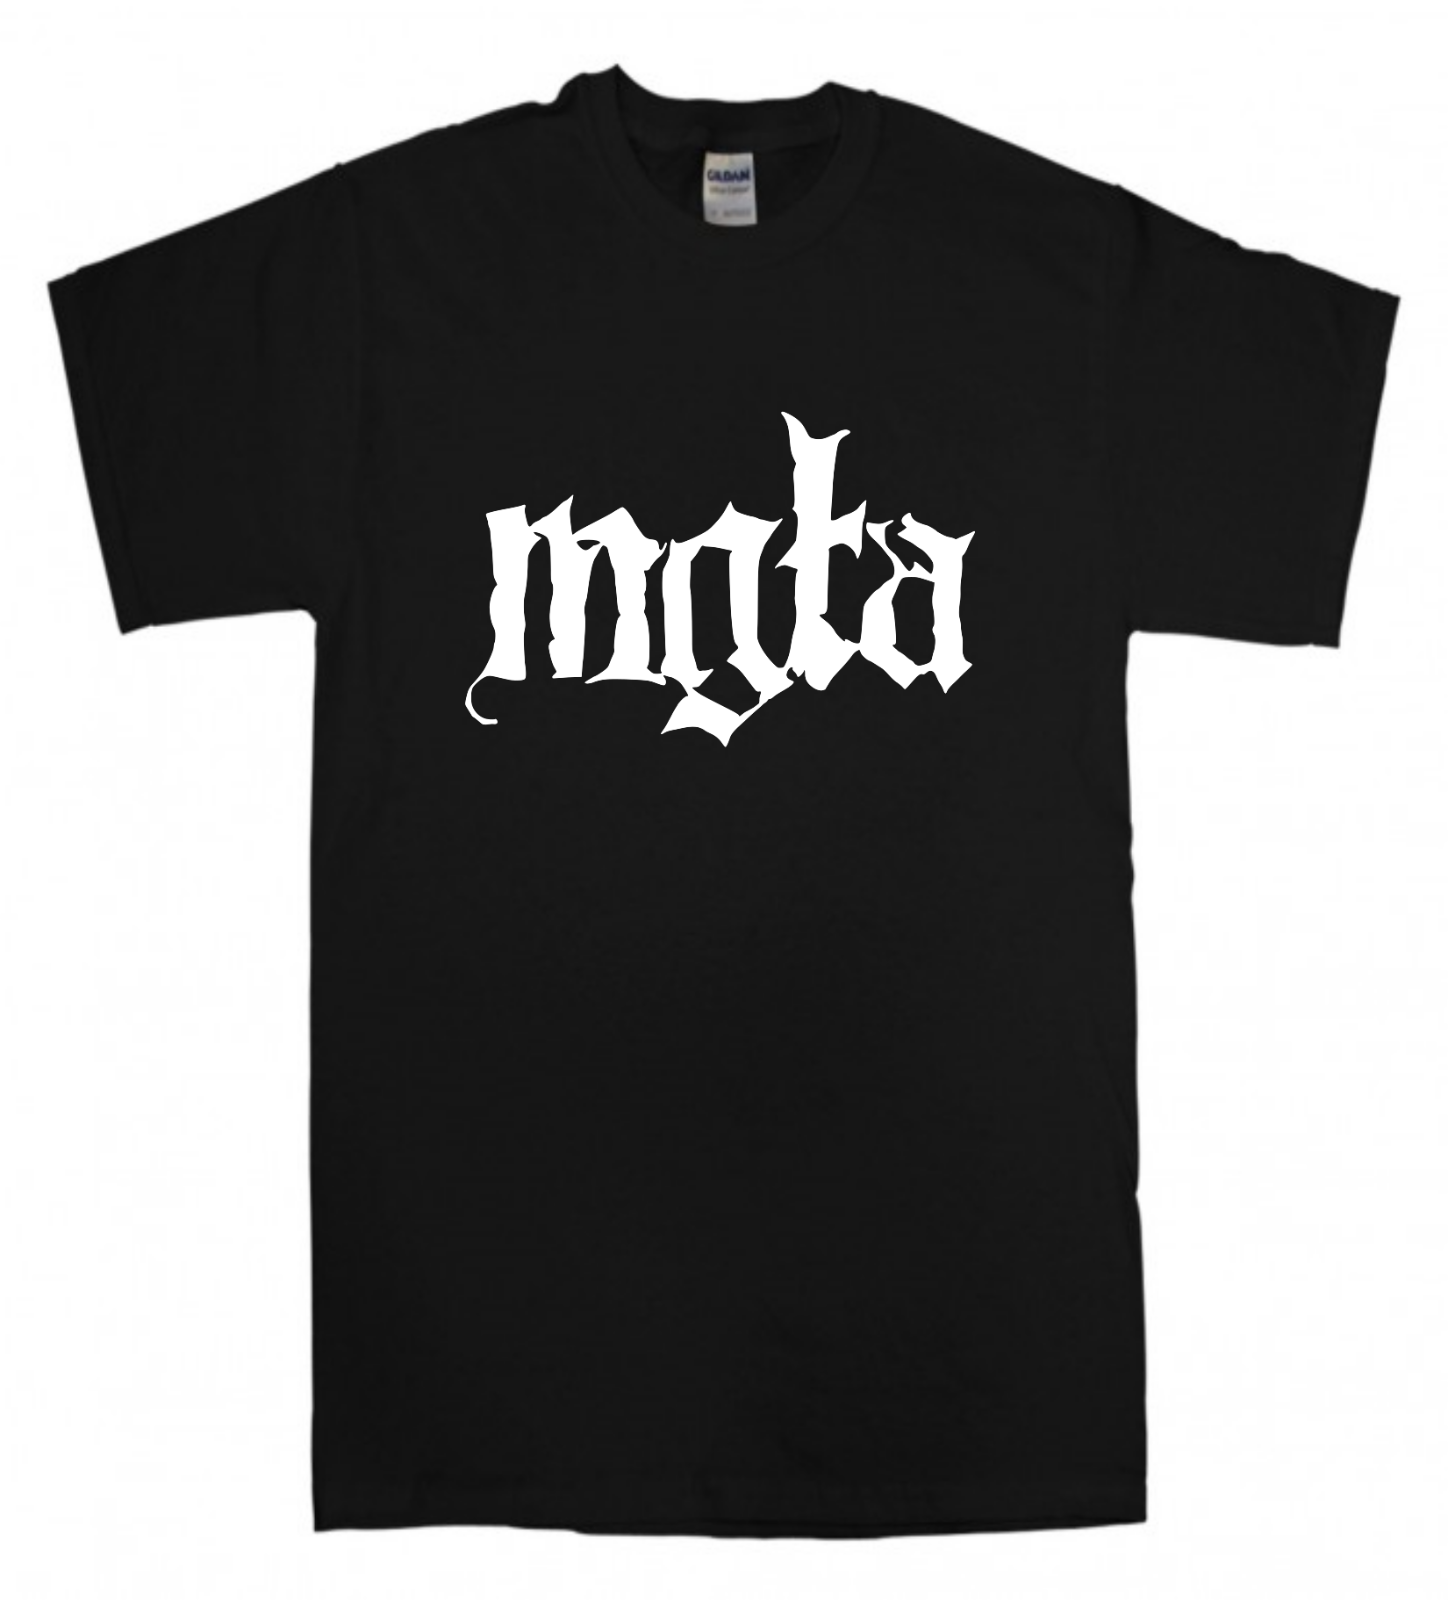 Mgla T-shirt New Black T shirt Black metal band Behemoth Emperor Dissectionmens Cotton T-shirt